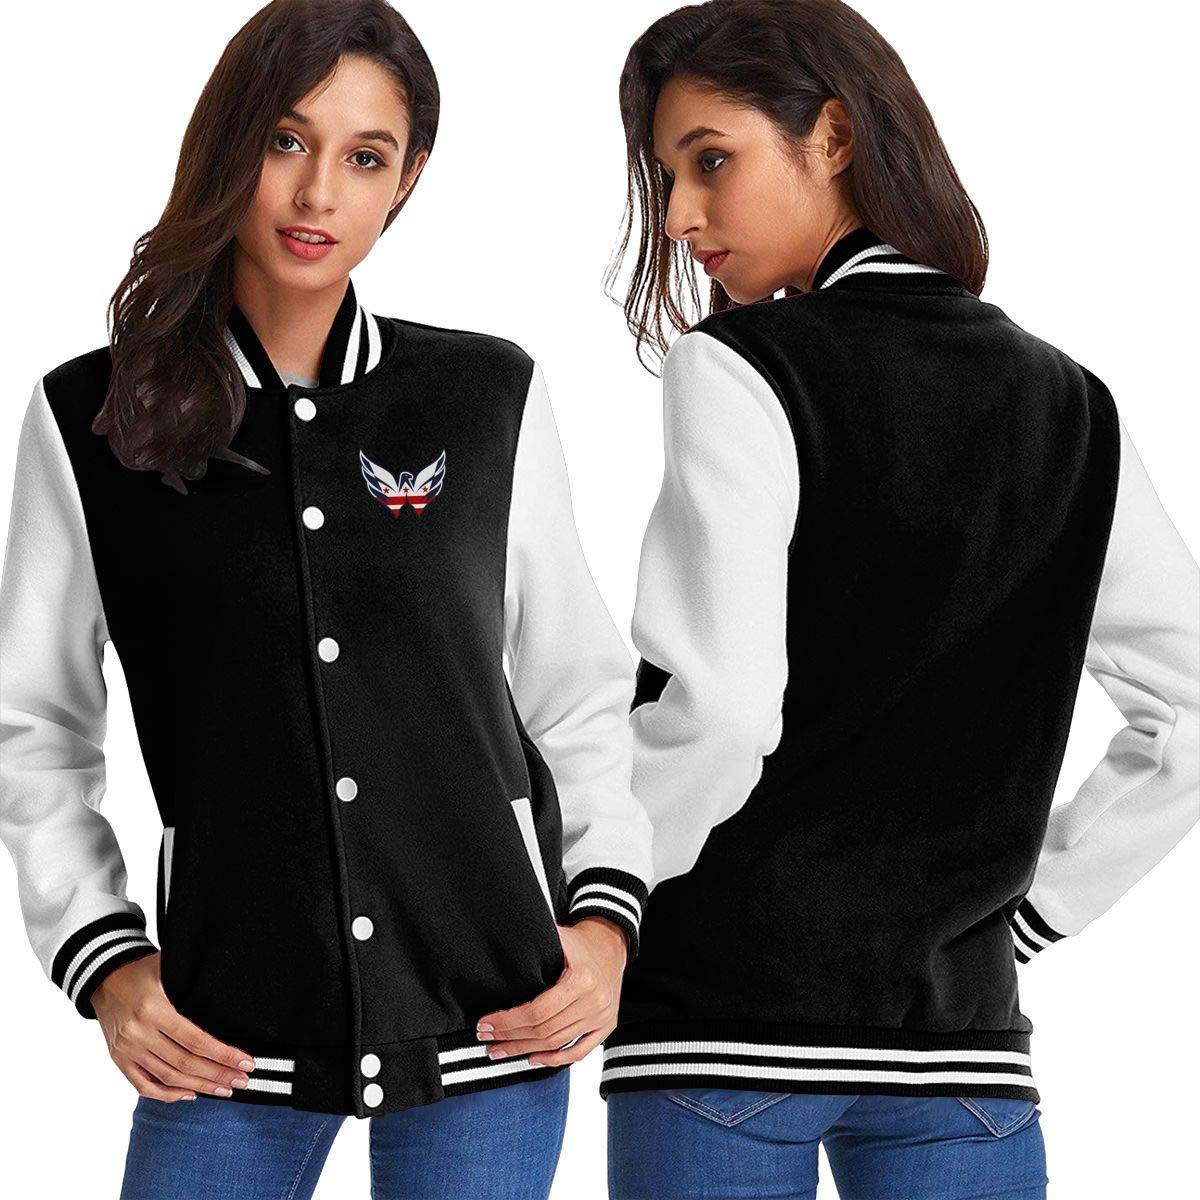 Black Women Basketballsadw 2016HockeyWashingtonCapitalFlag Baseball Uniform Jacket